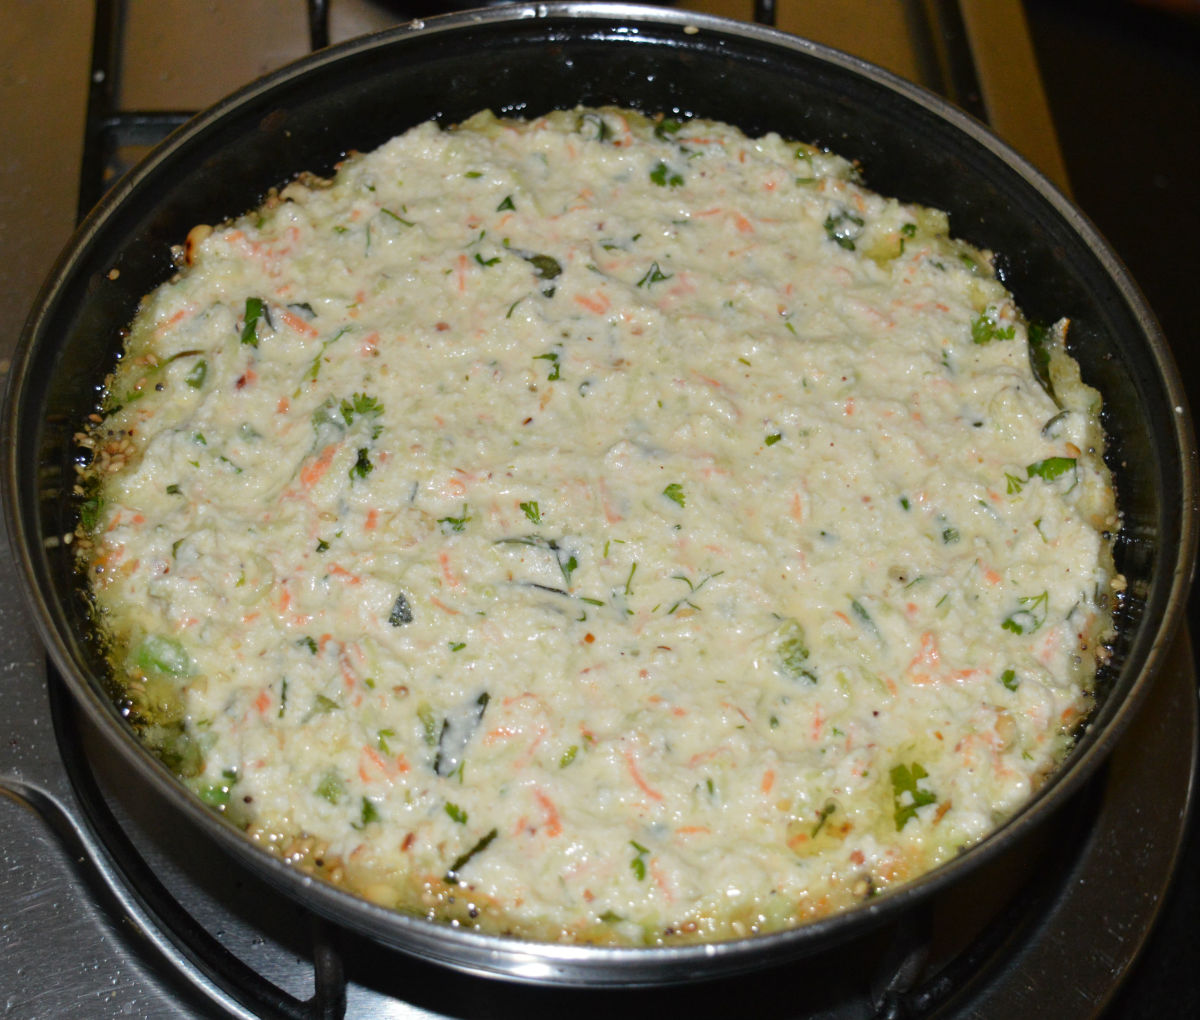 How to Make Instant Pan Handvo (Vegetable Semolina Pancake)